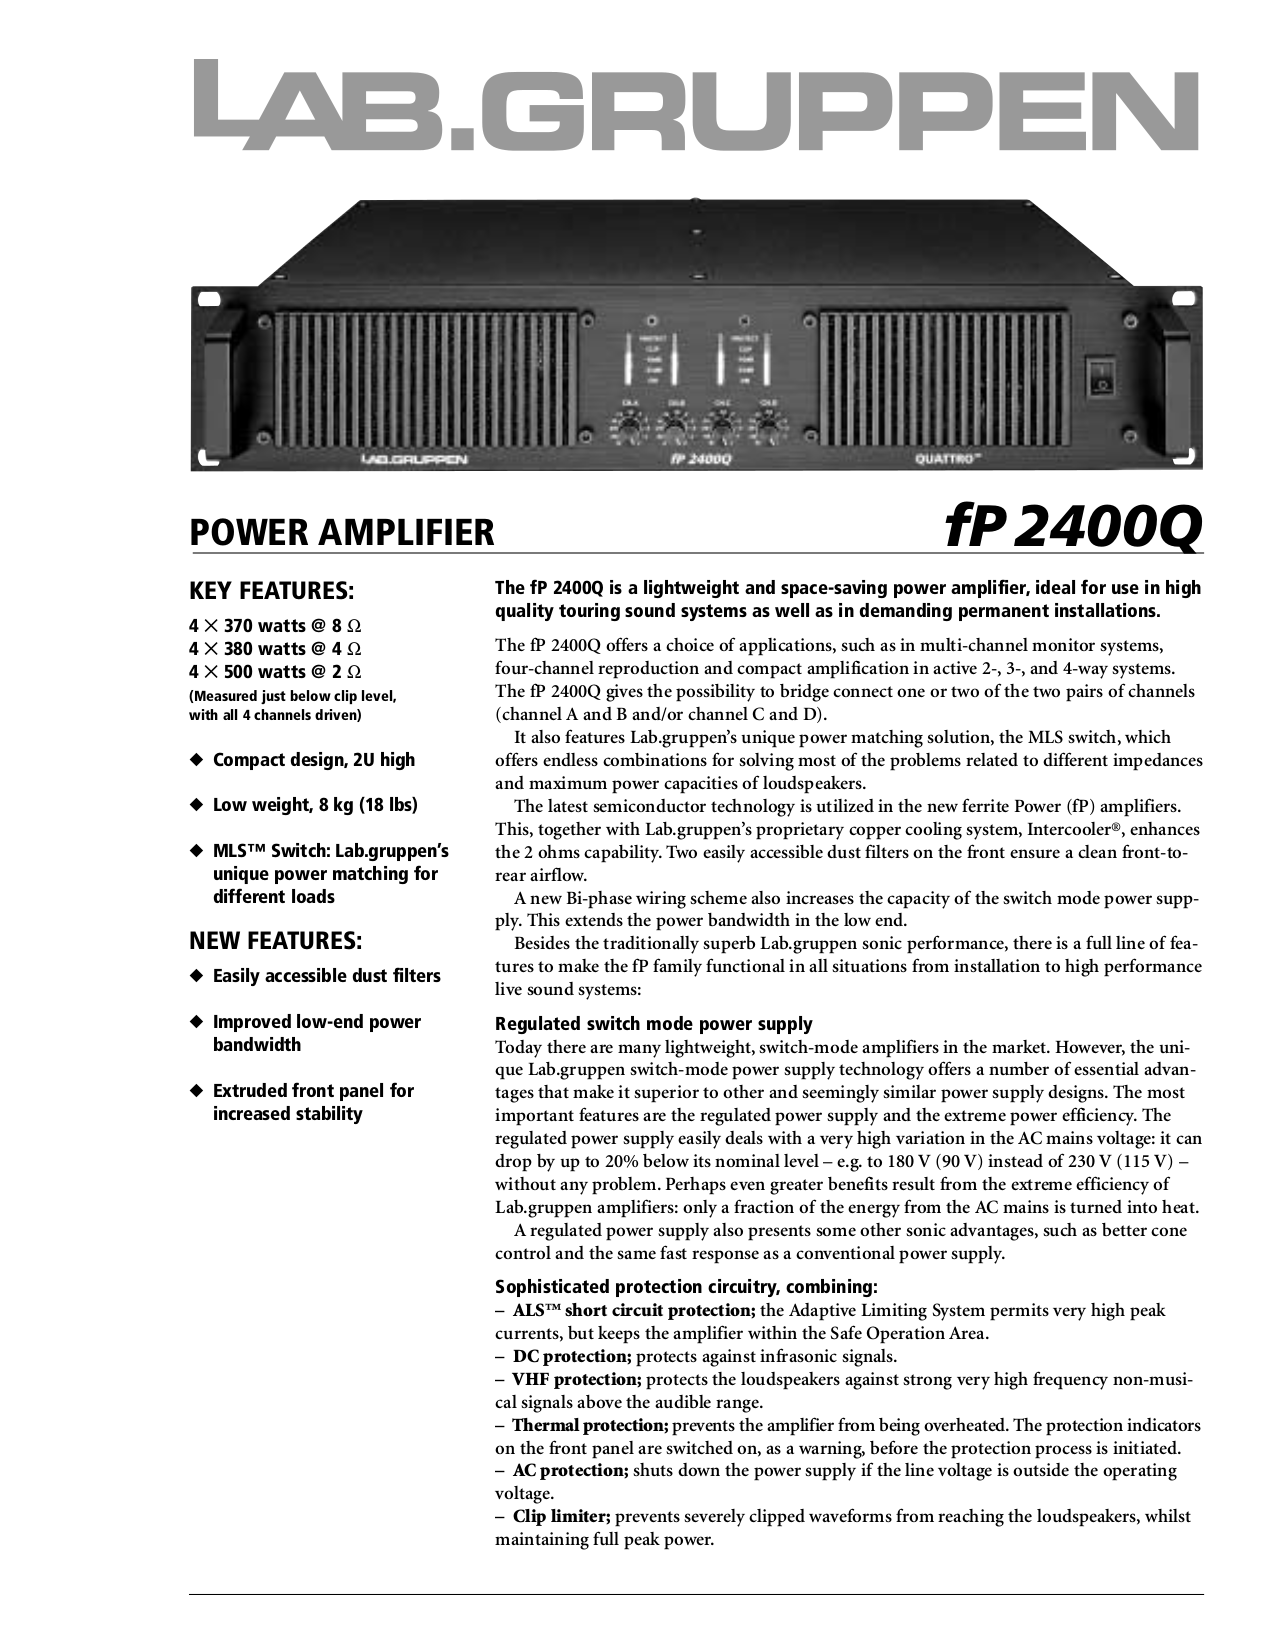 viewtv at 300 manual pdf